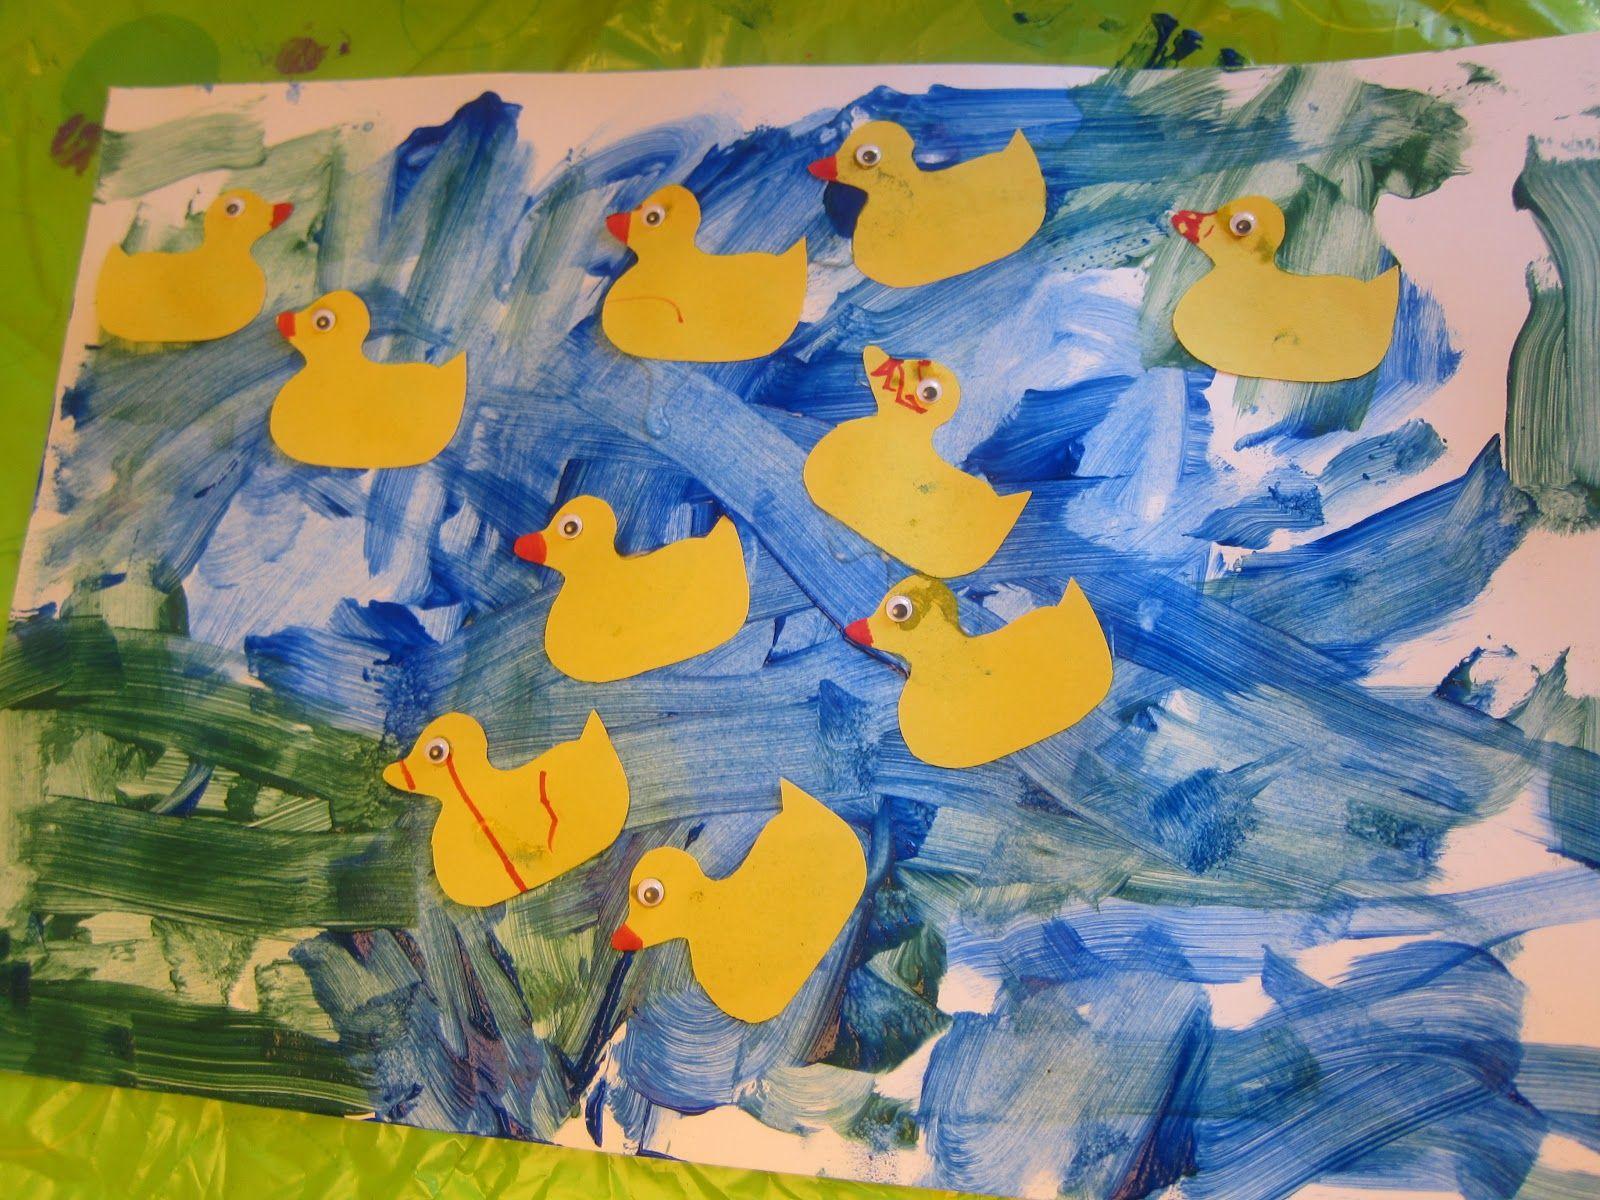 10 Little Rubber Ducks Activities